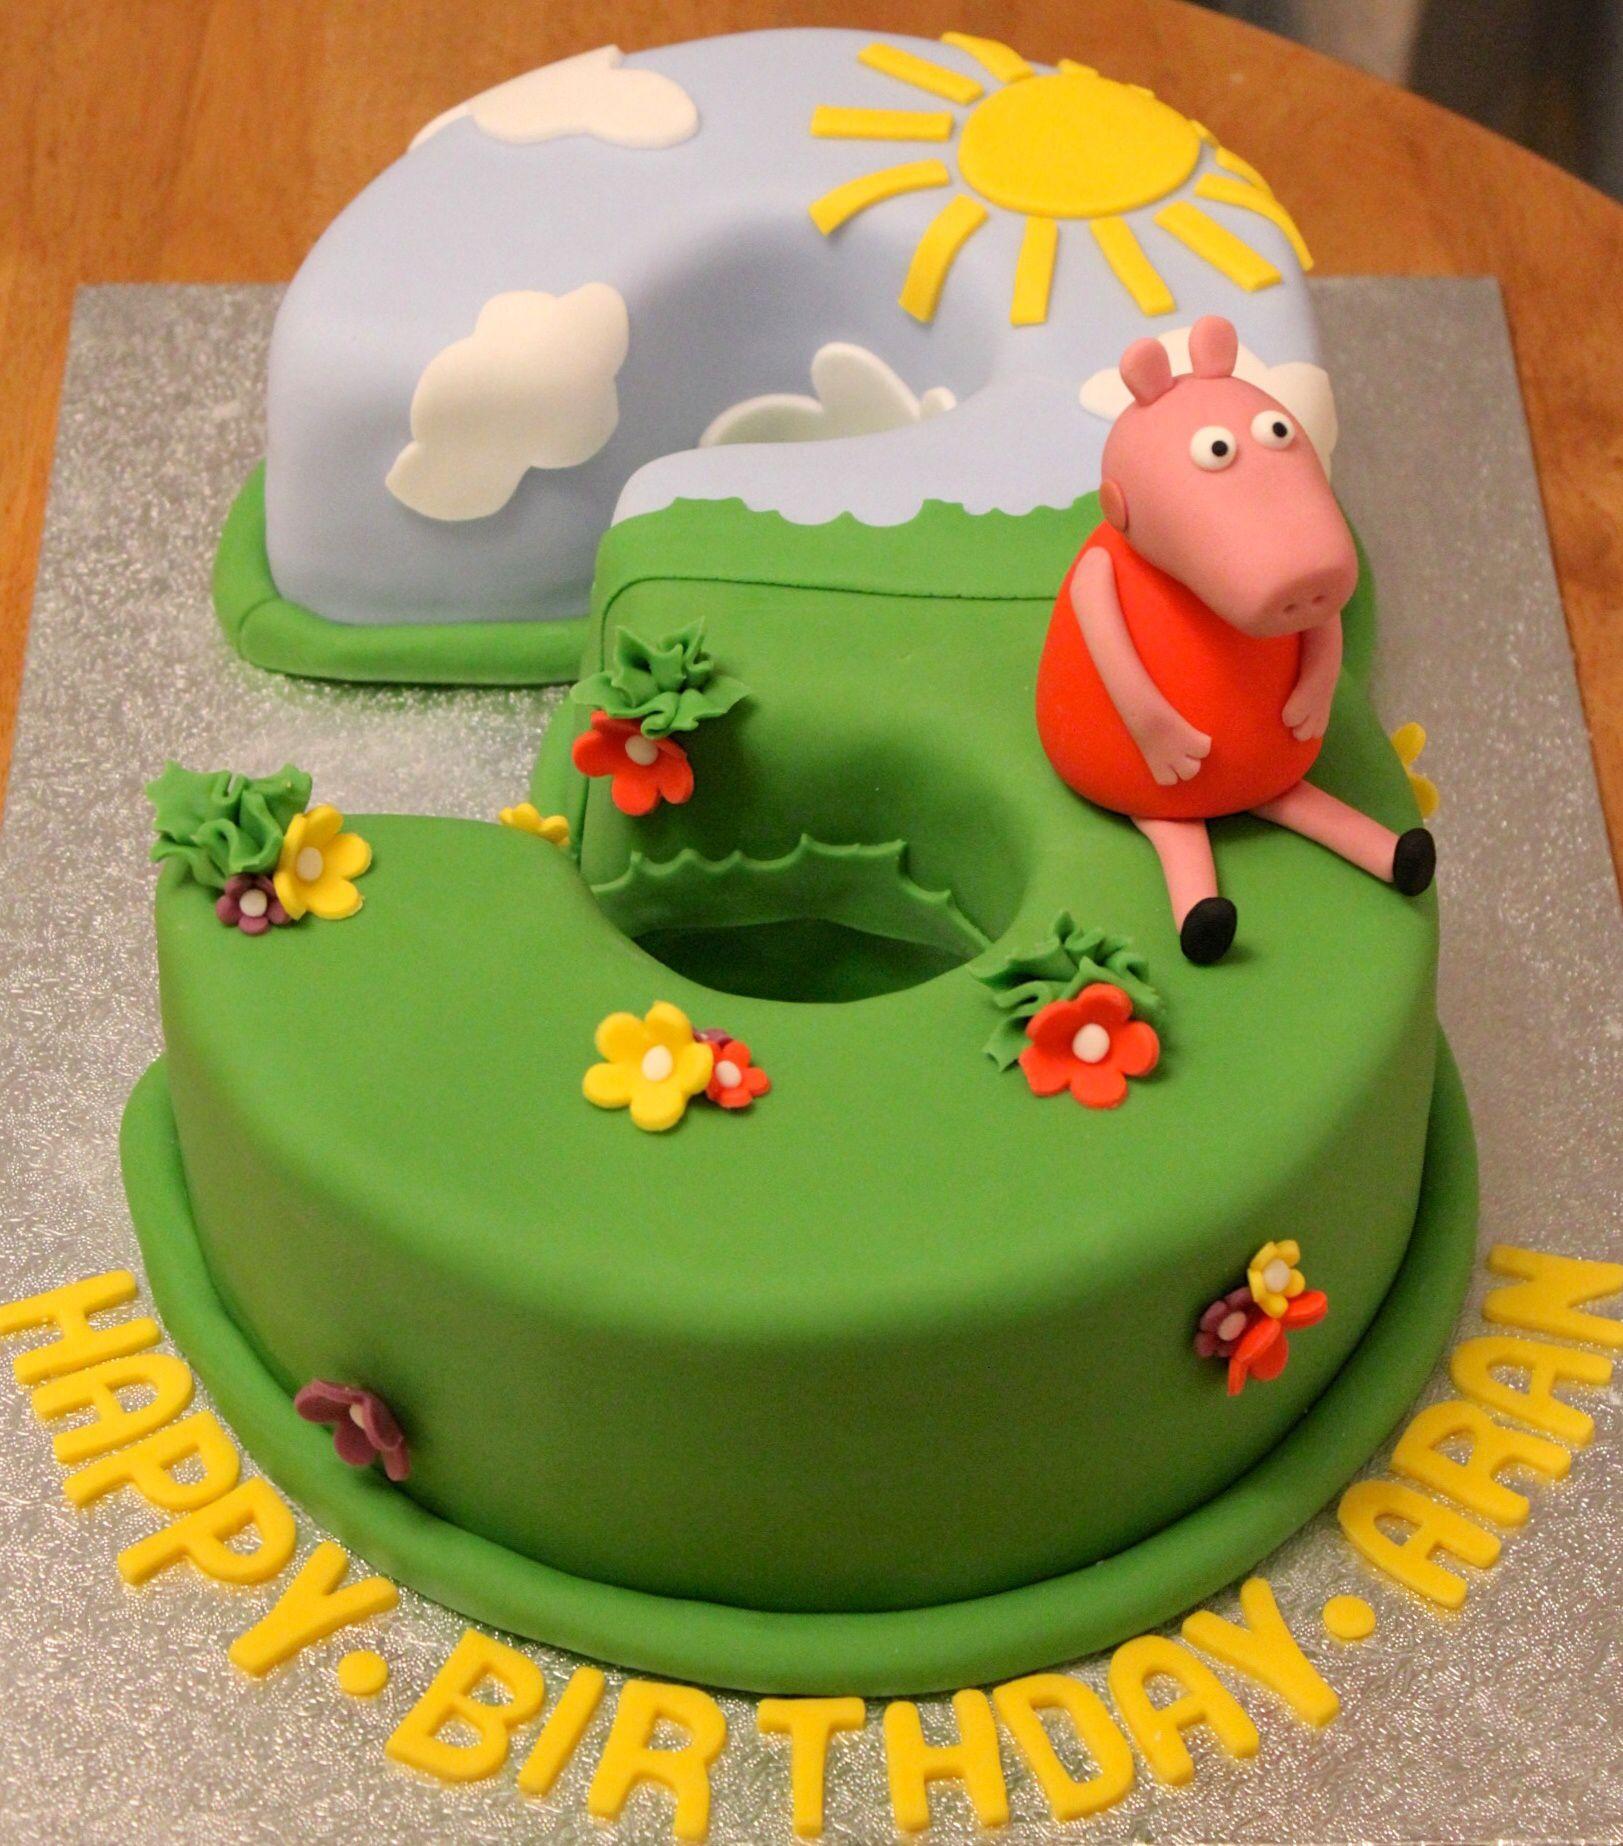 Peppa Pig 3rd Birthday Cake By Fondant Fancy